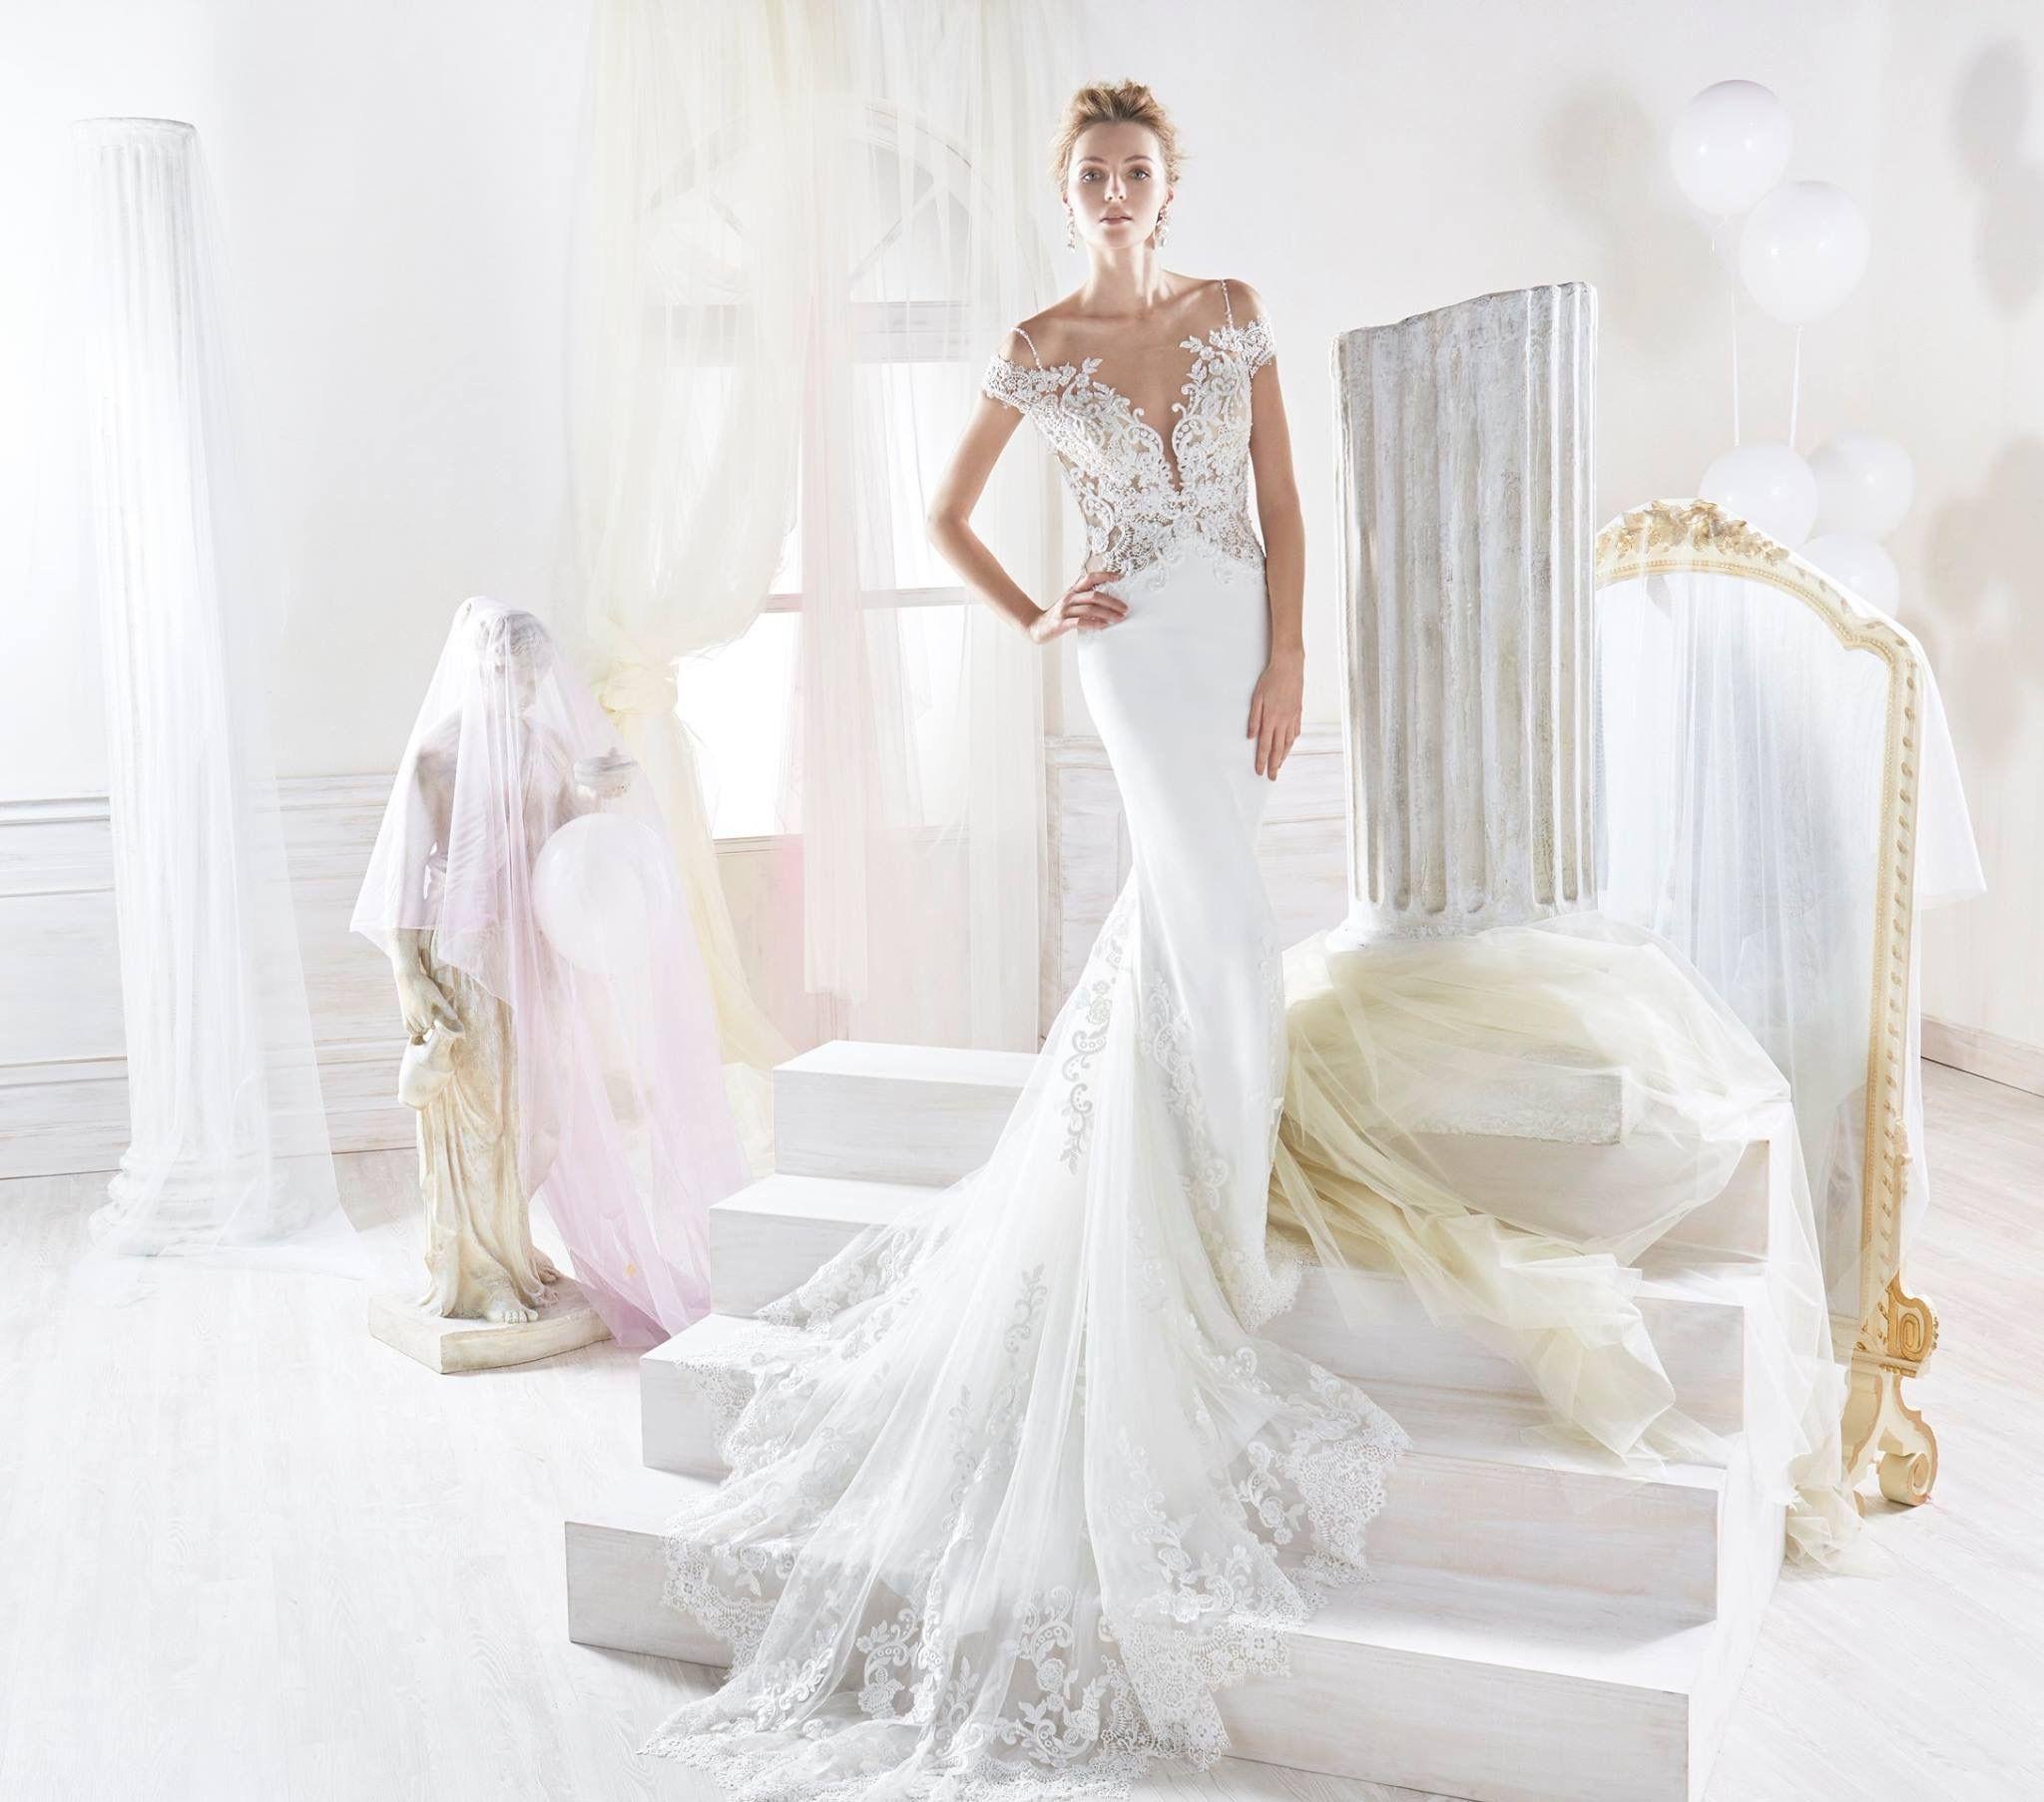 Nicole wedding dress mermaid wedding dresses pinterest